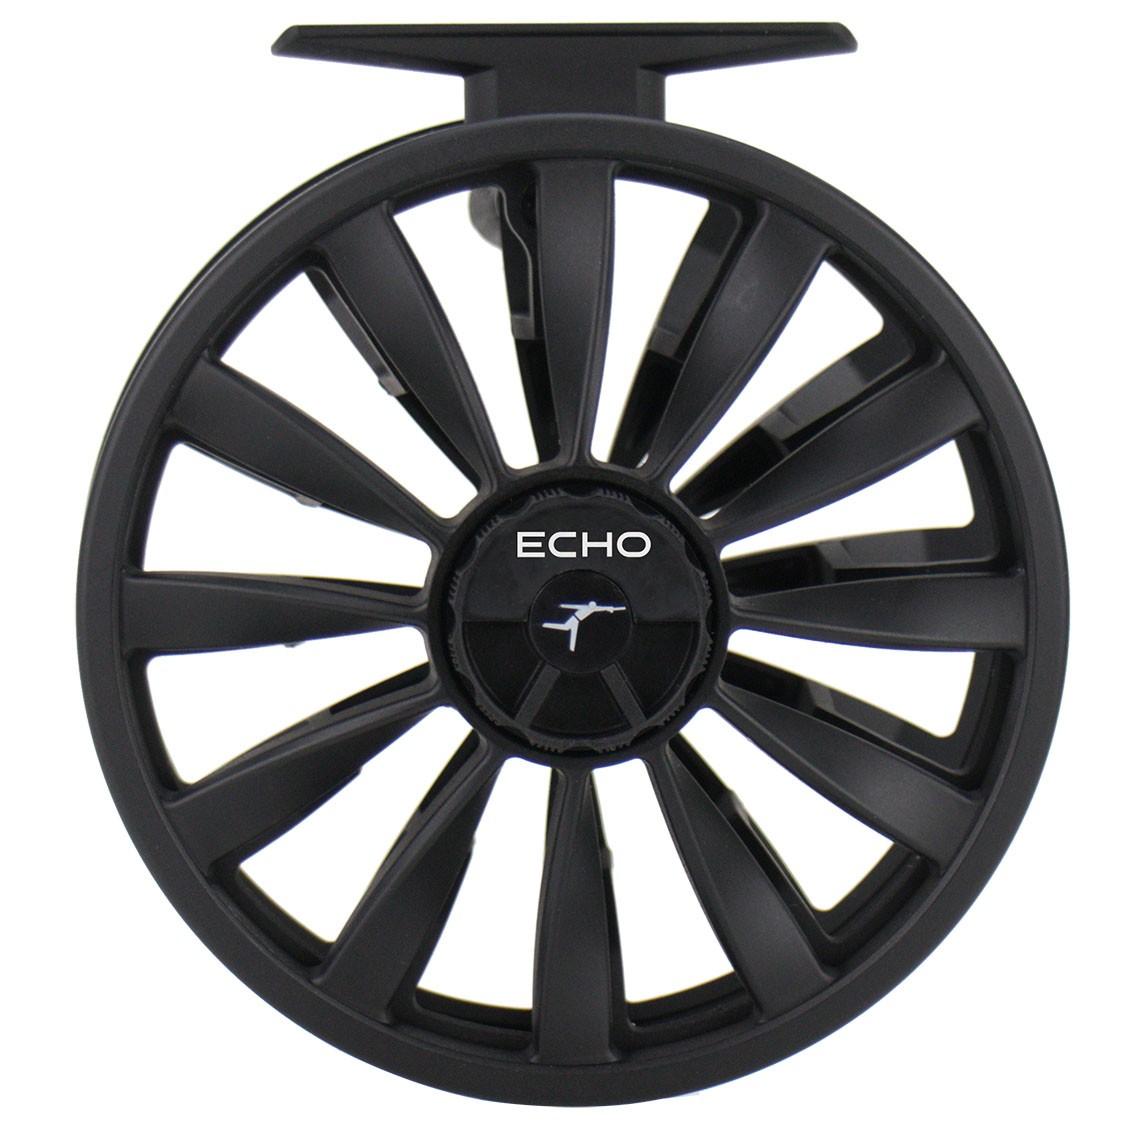 Carretilha de Fly ECHO Bravo LT